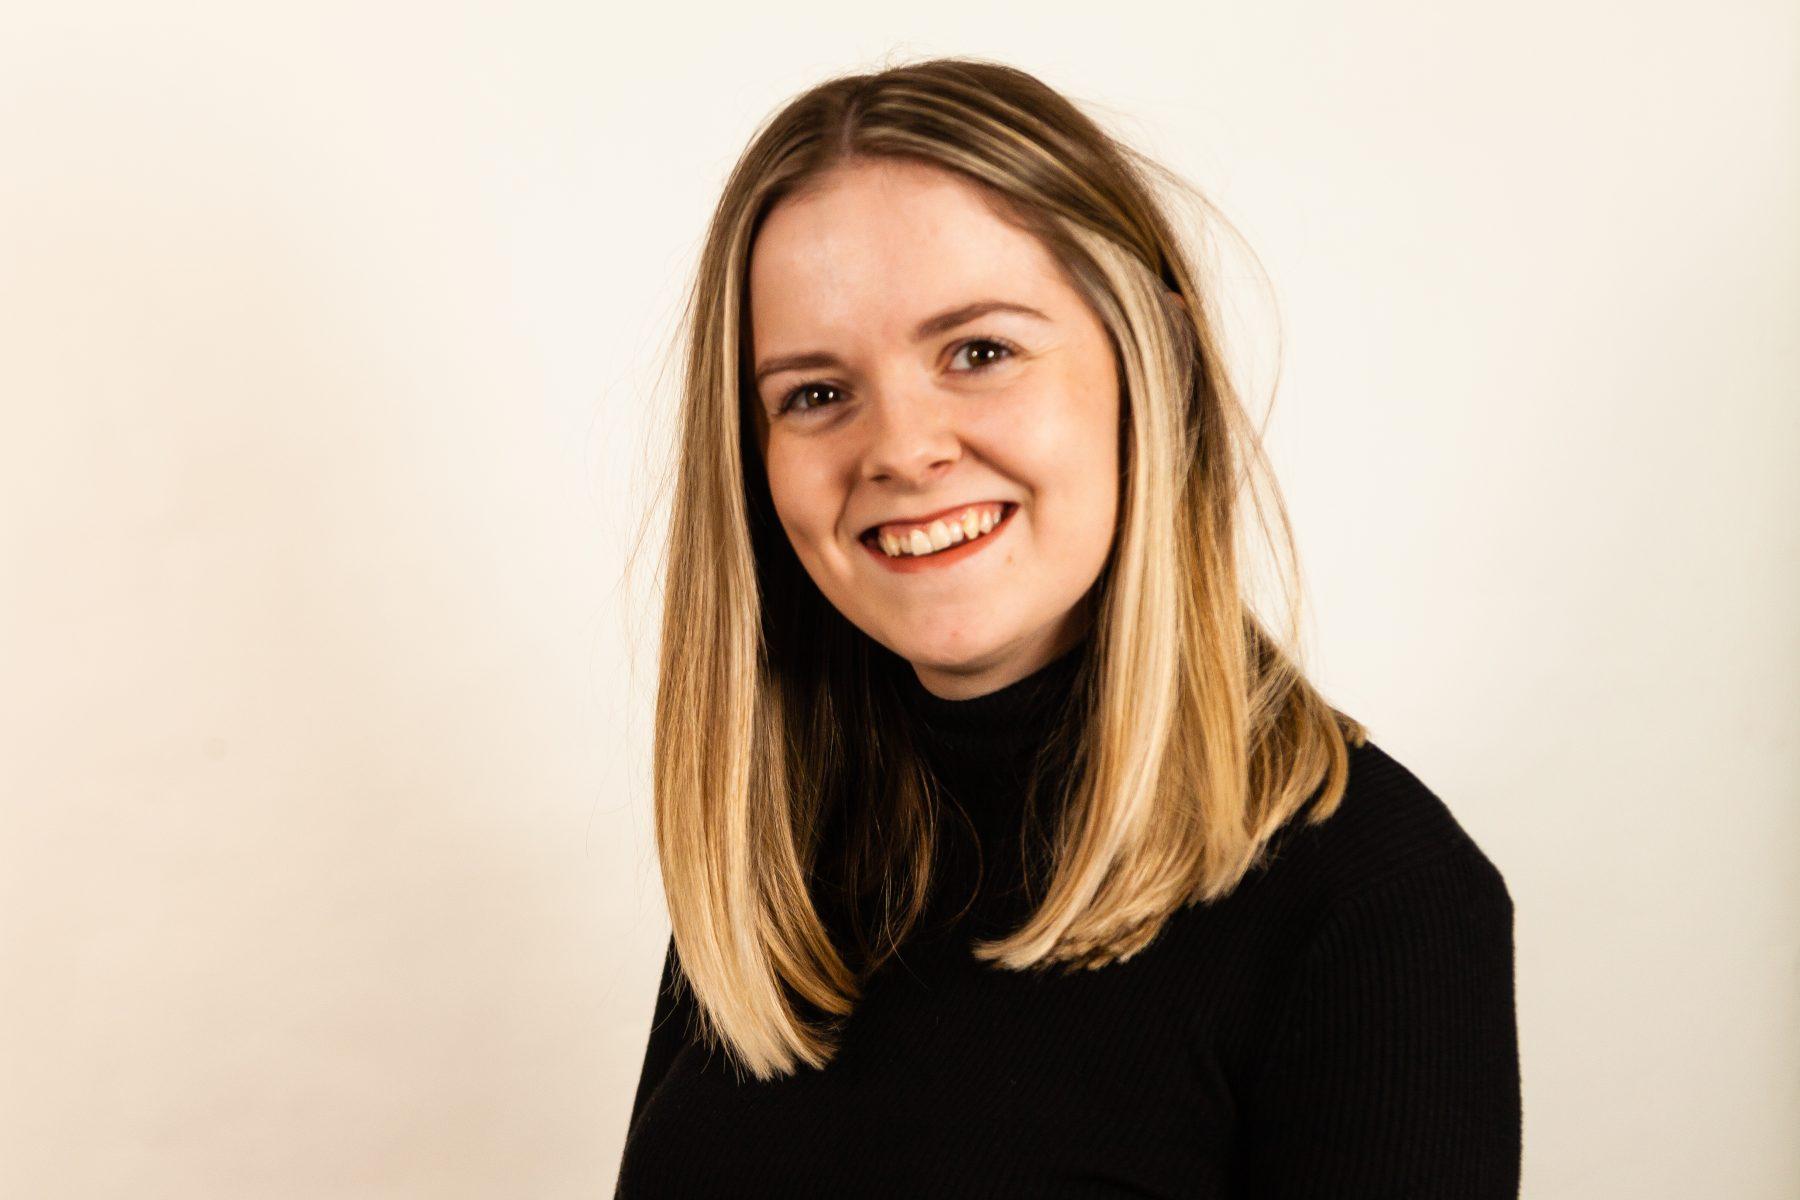 Catriona Quinn is a member of the award-winning PR team at Holyrood PR agency in Edinburgh, Scotland